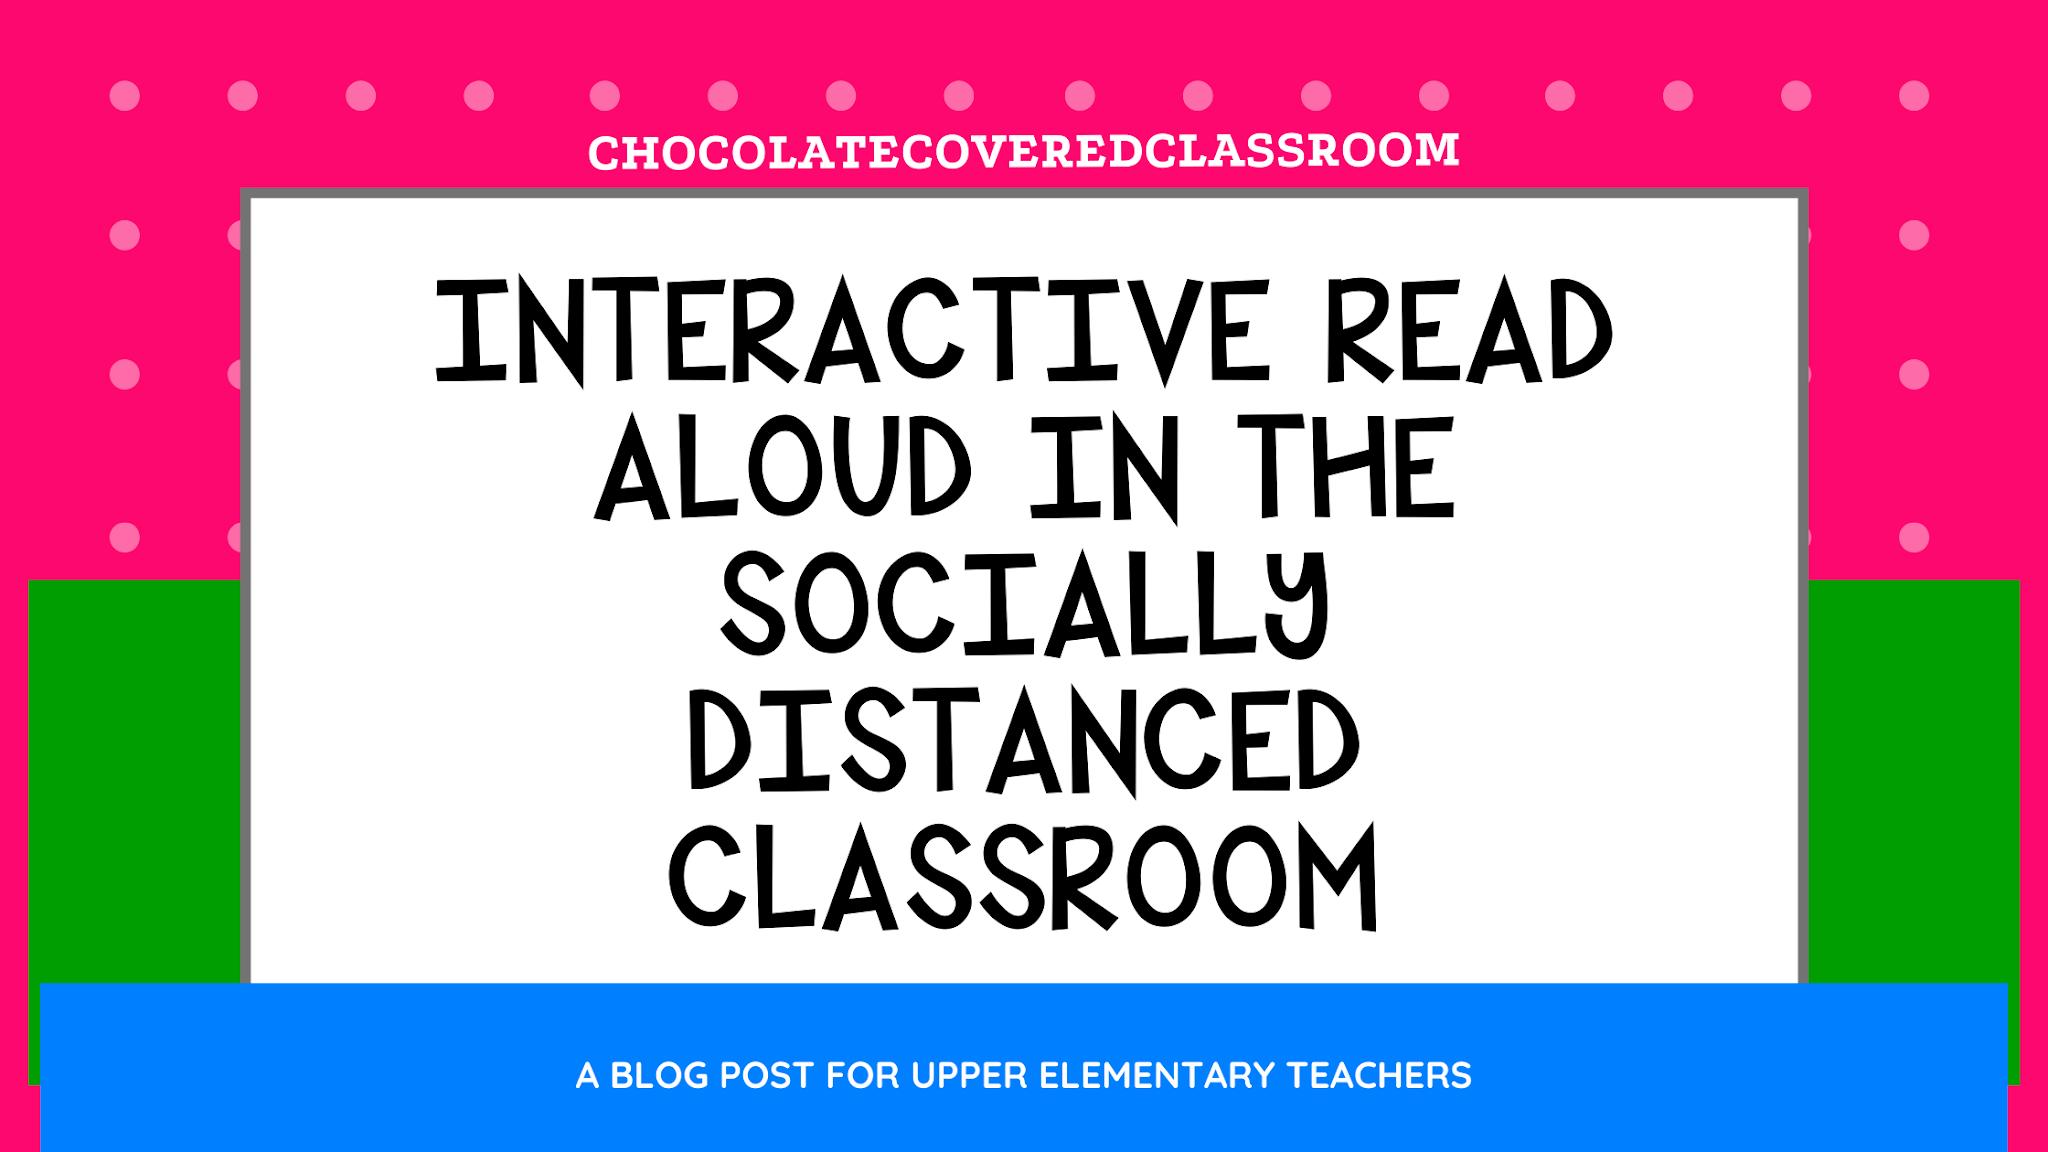 Interactive Read Aloud in the Socially Distanced Classroom